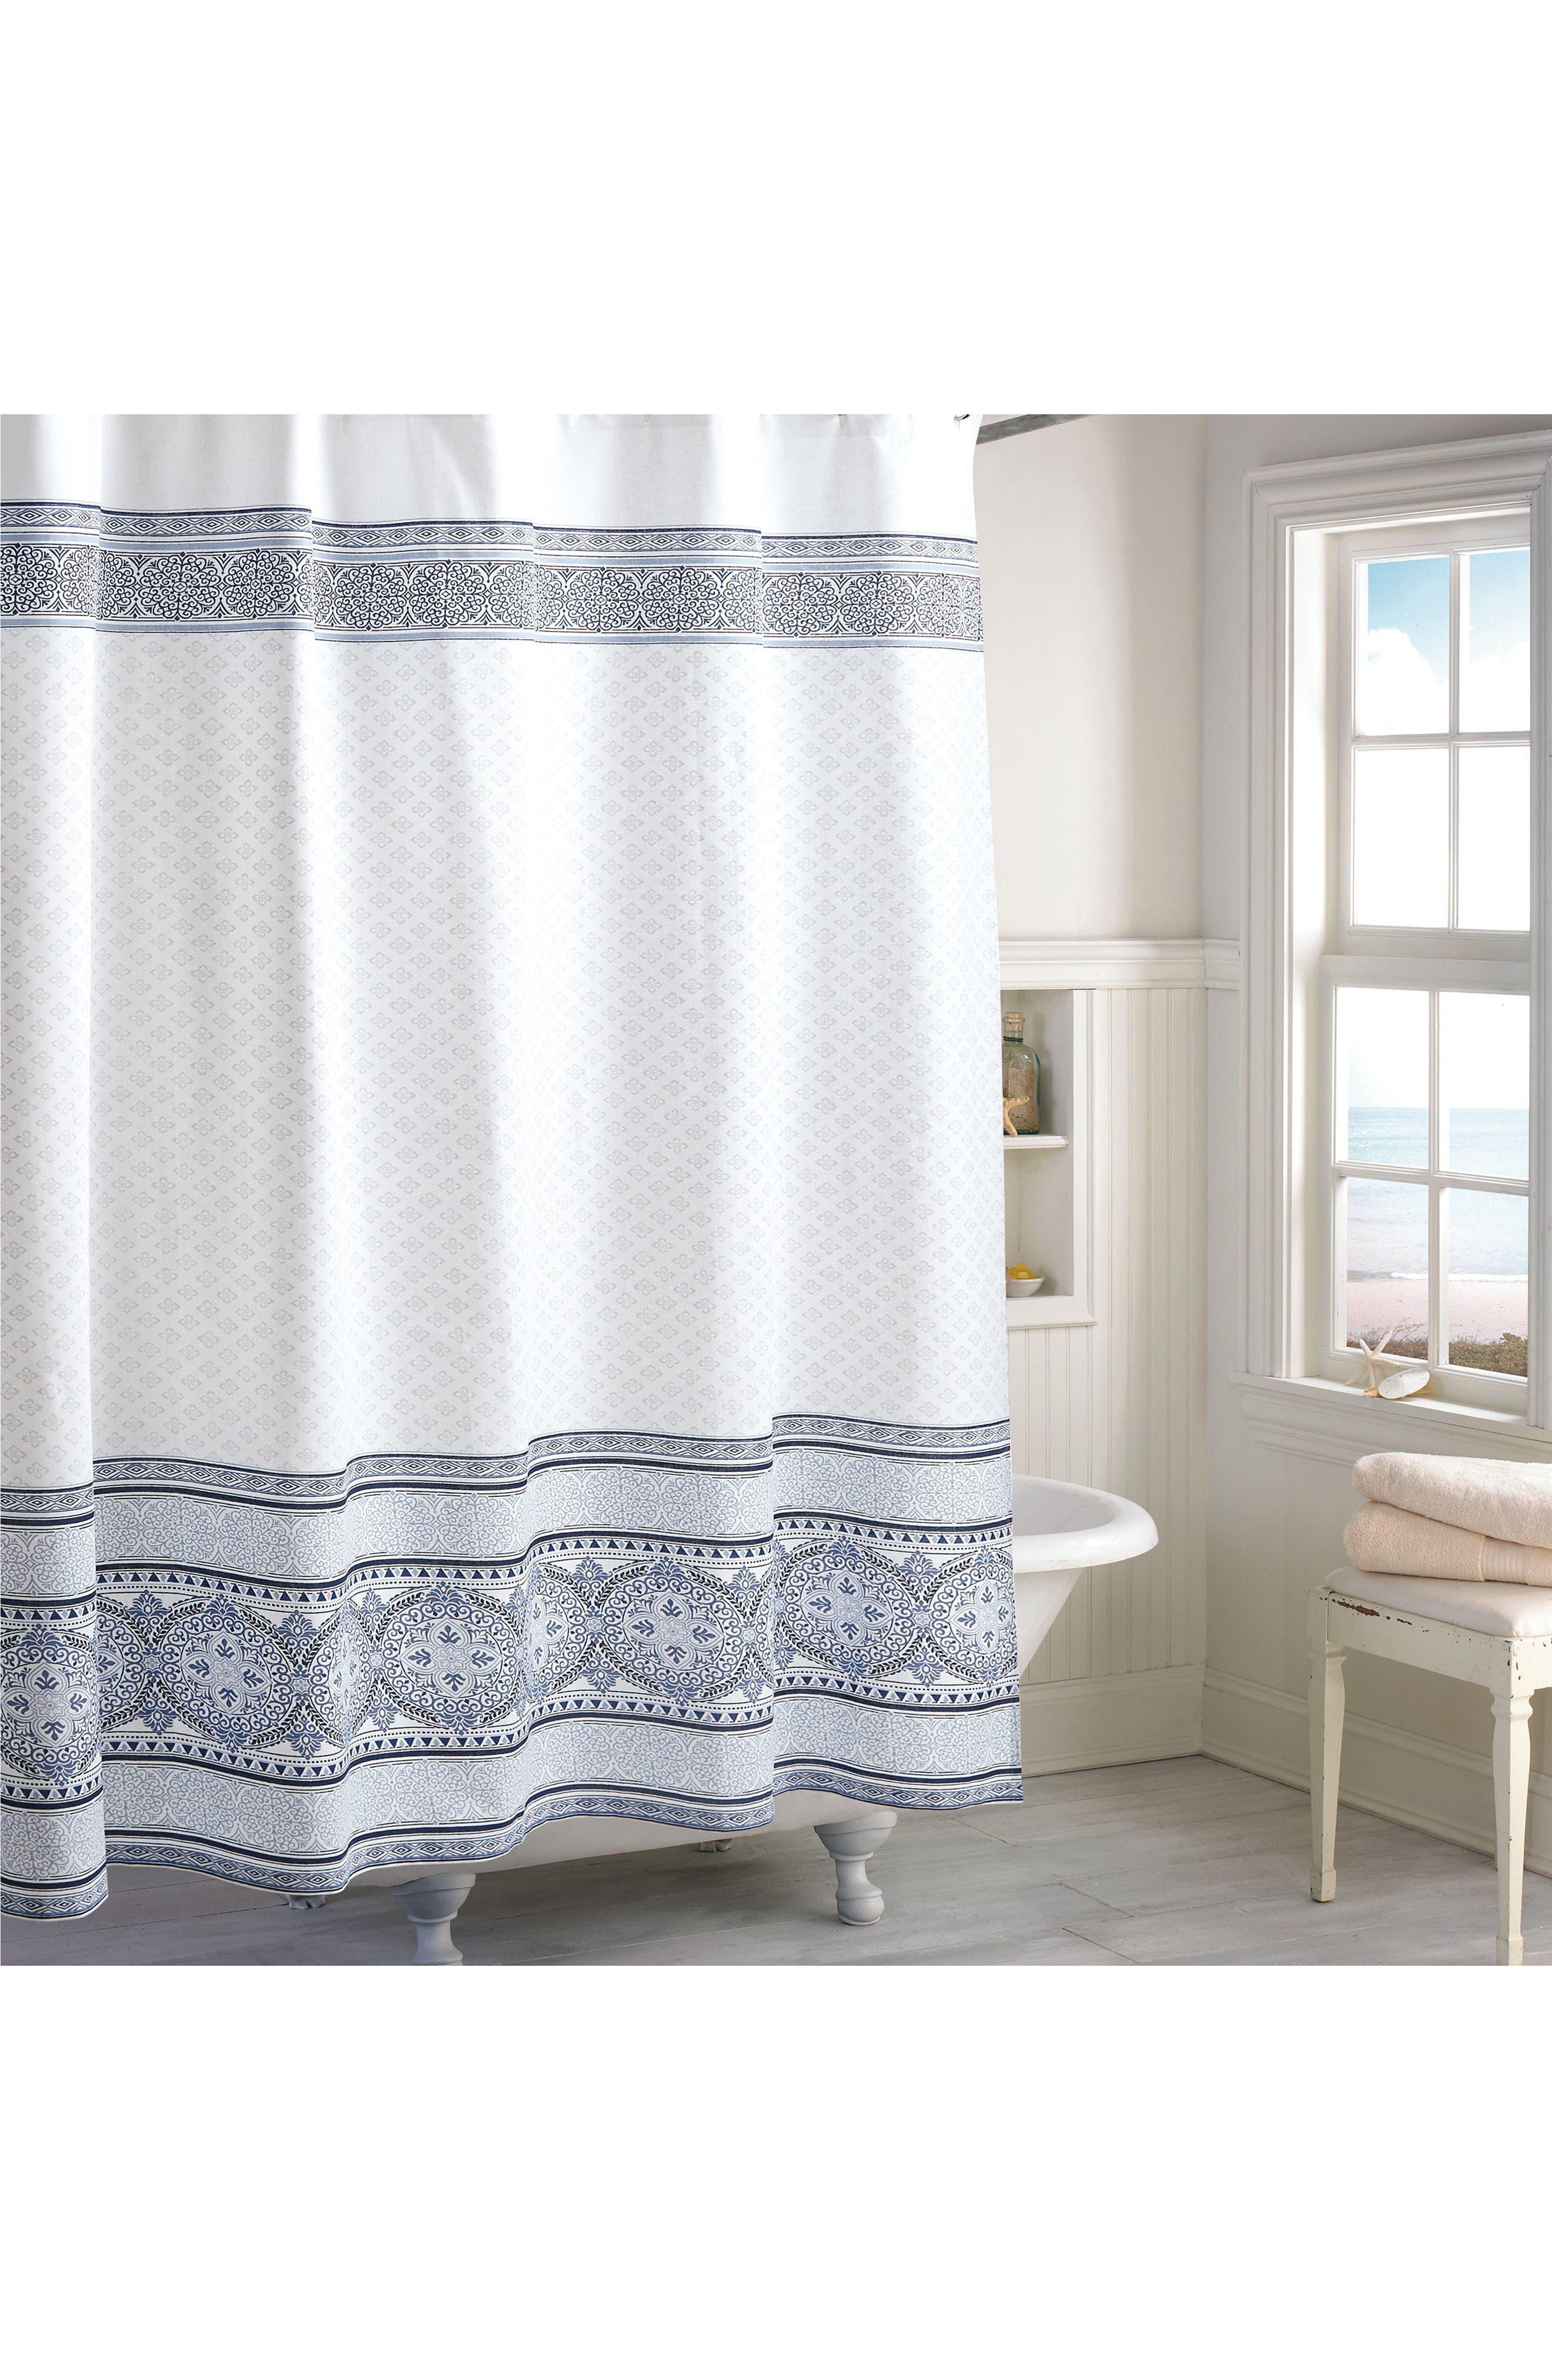 Peri Home Medallion Border Shower Curtain